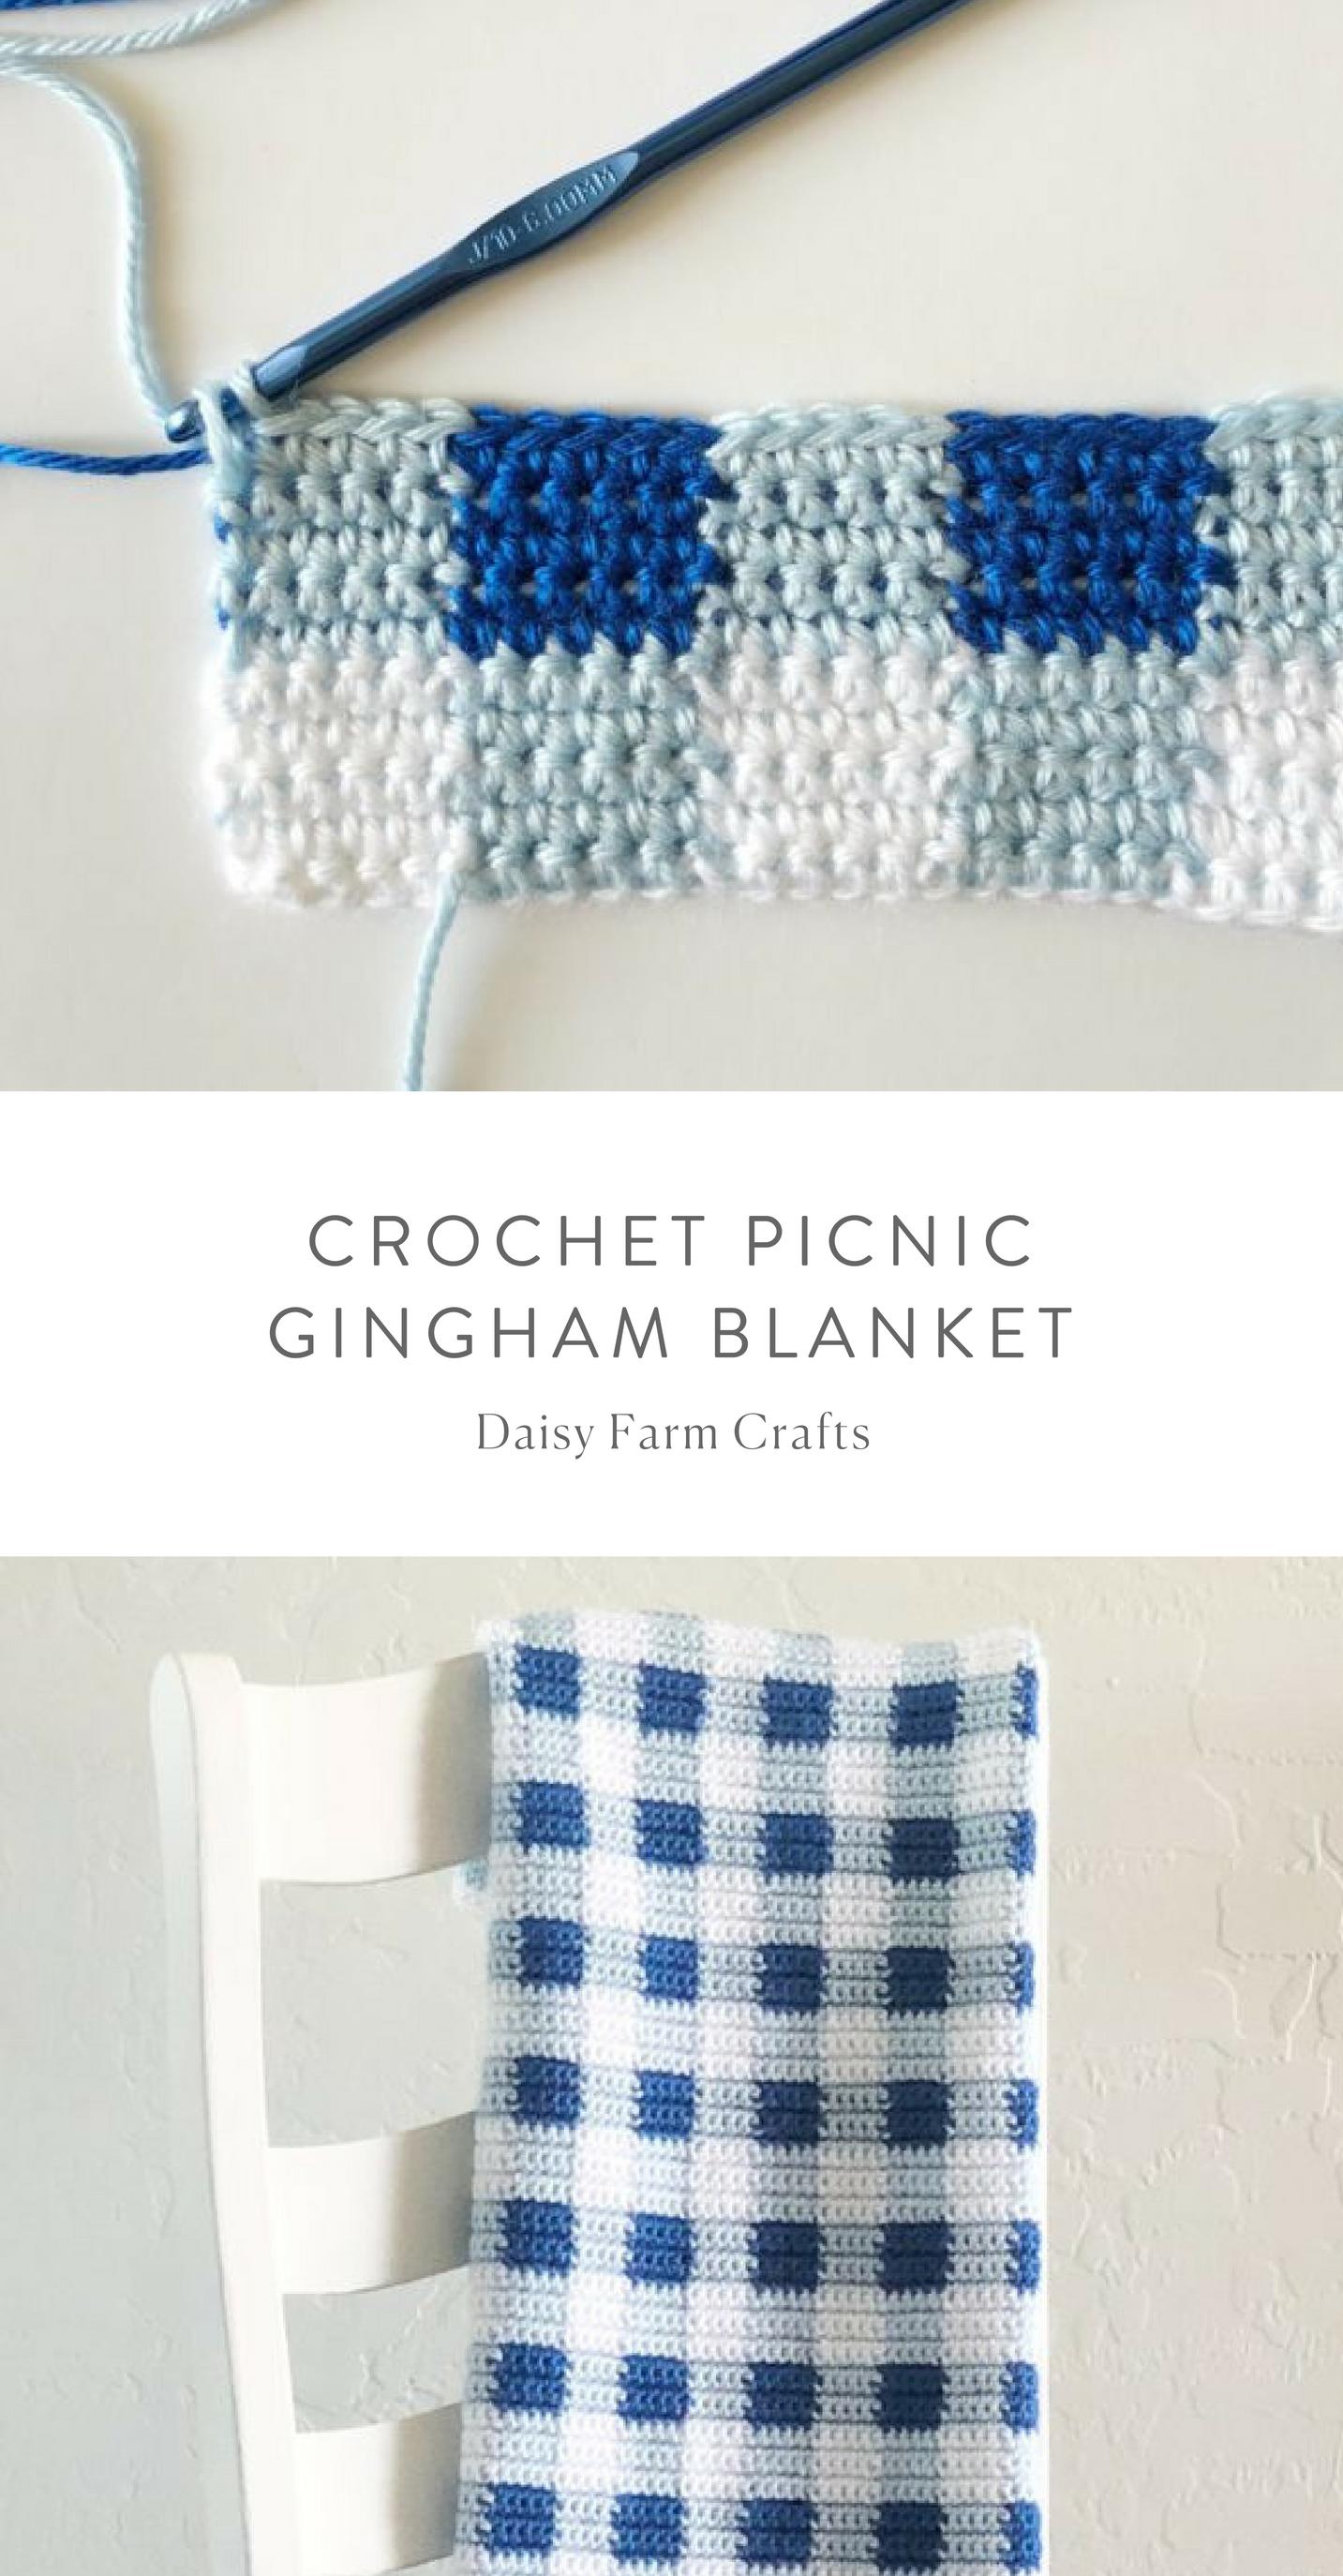 Daisy Farm Crafts Crochet Blanket Patterns Crochet Stitches For Blankets Crochet Knit Blanket